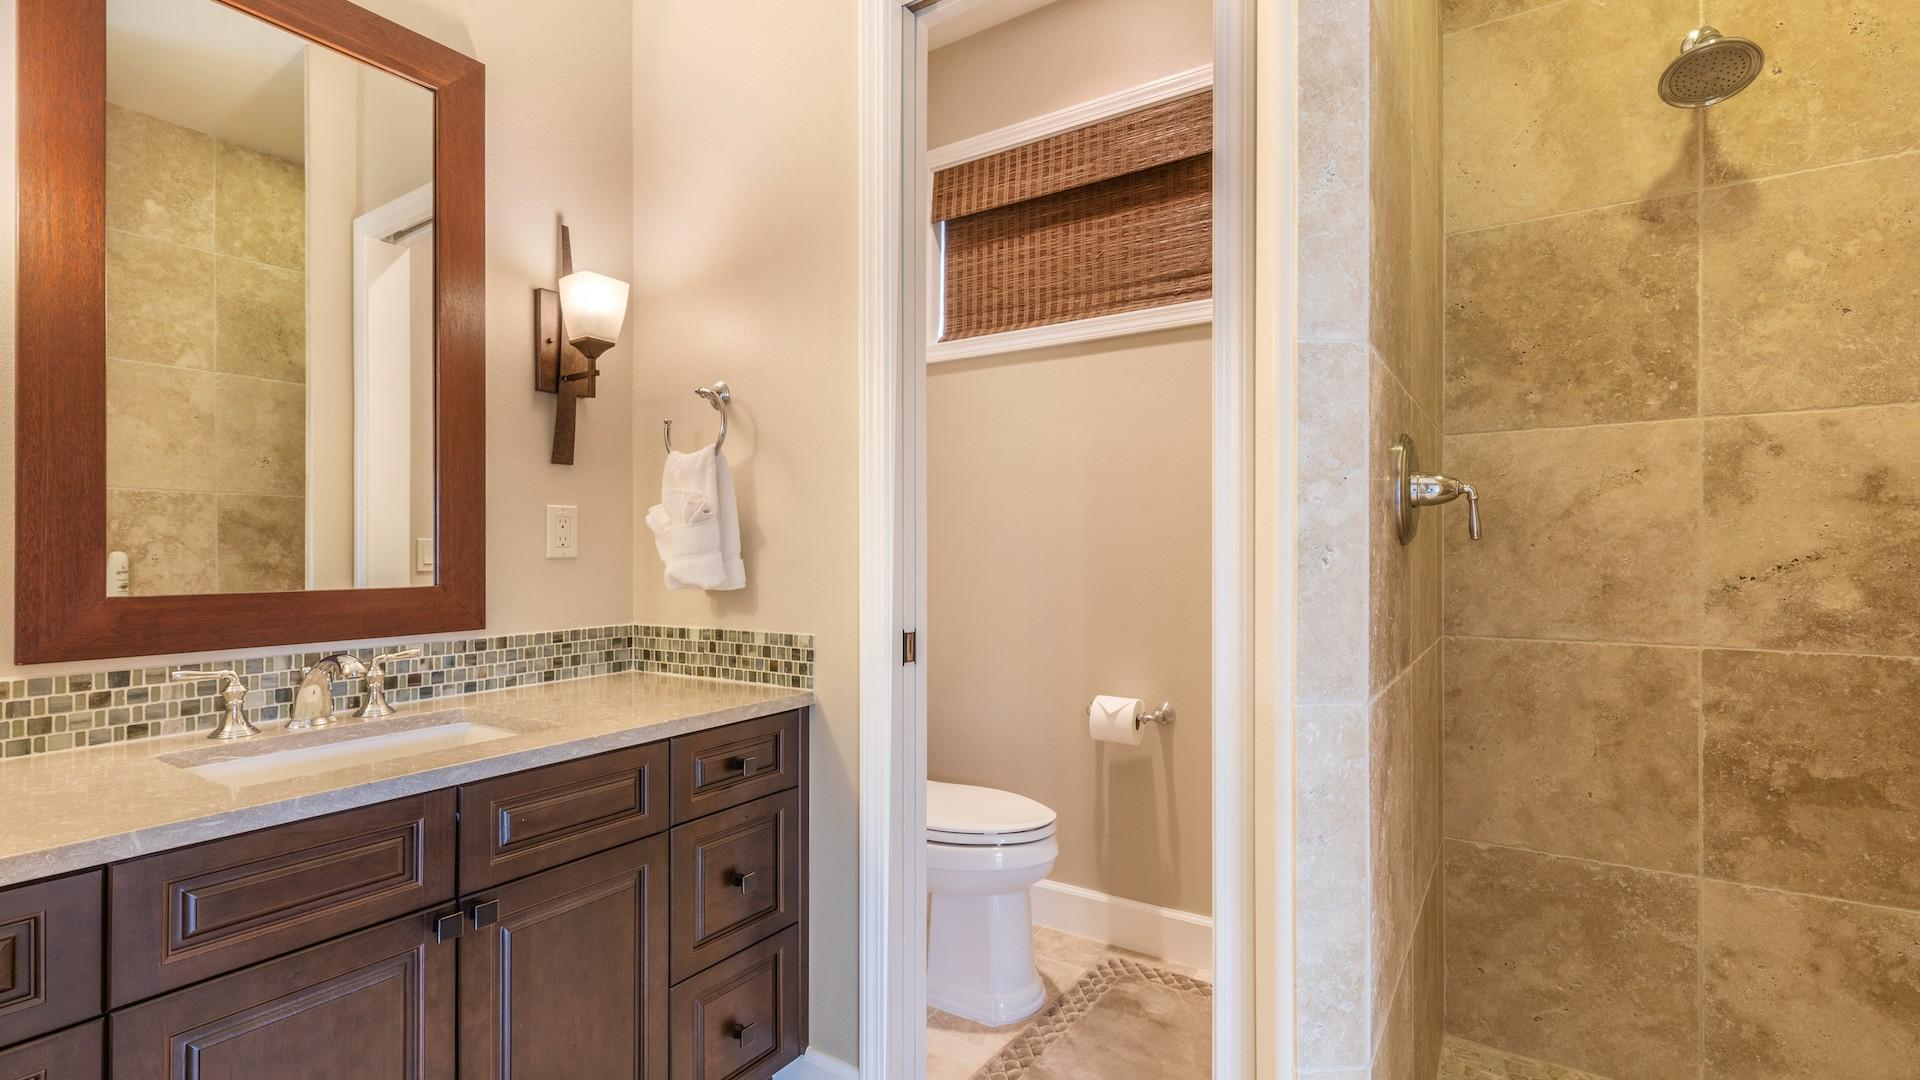 Fourth bath, with sandstone tiles and ocean-toned backsplash.